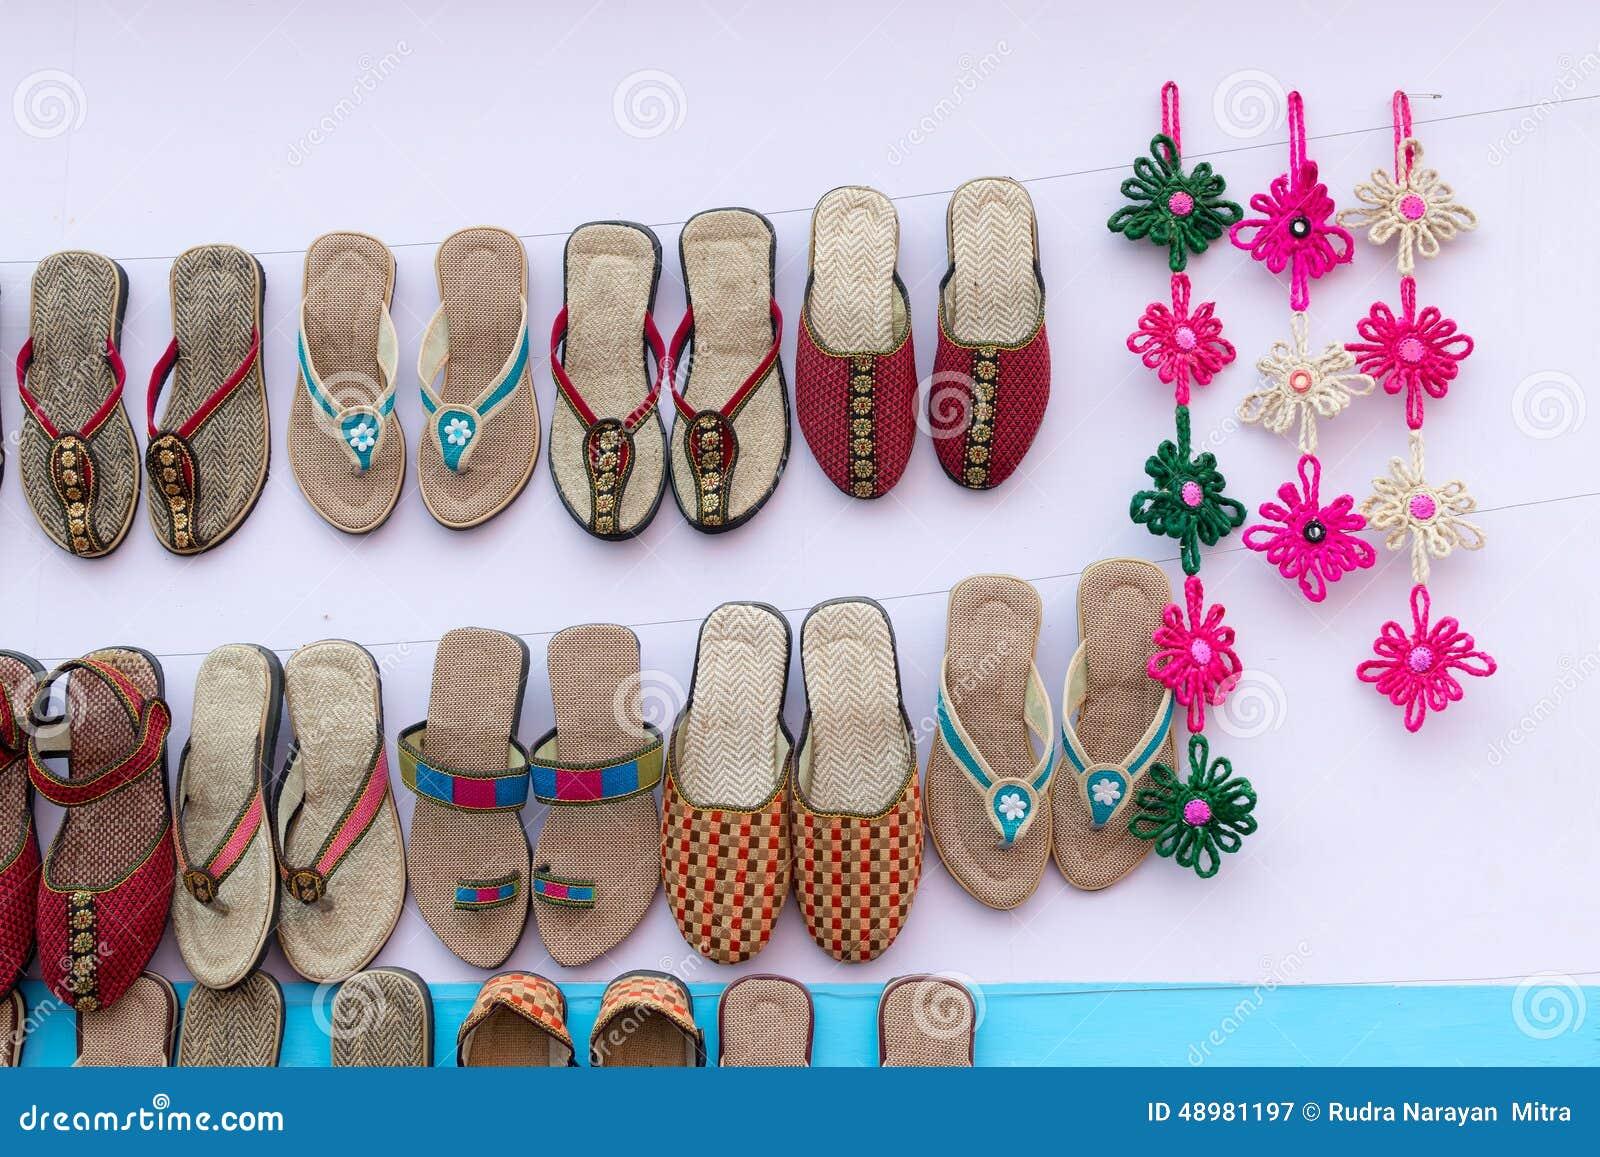 13660c2f179 Handmade Jute Shoes